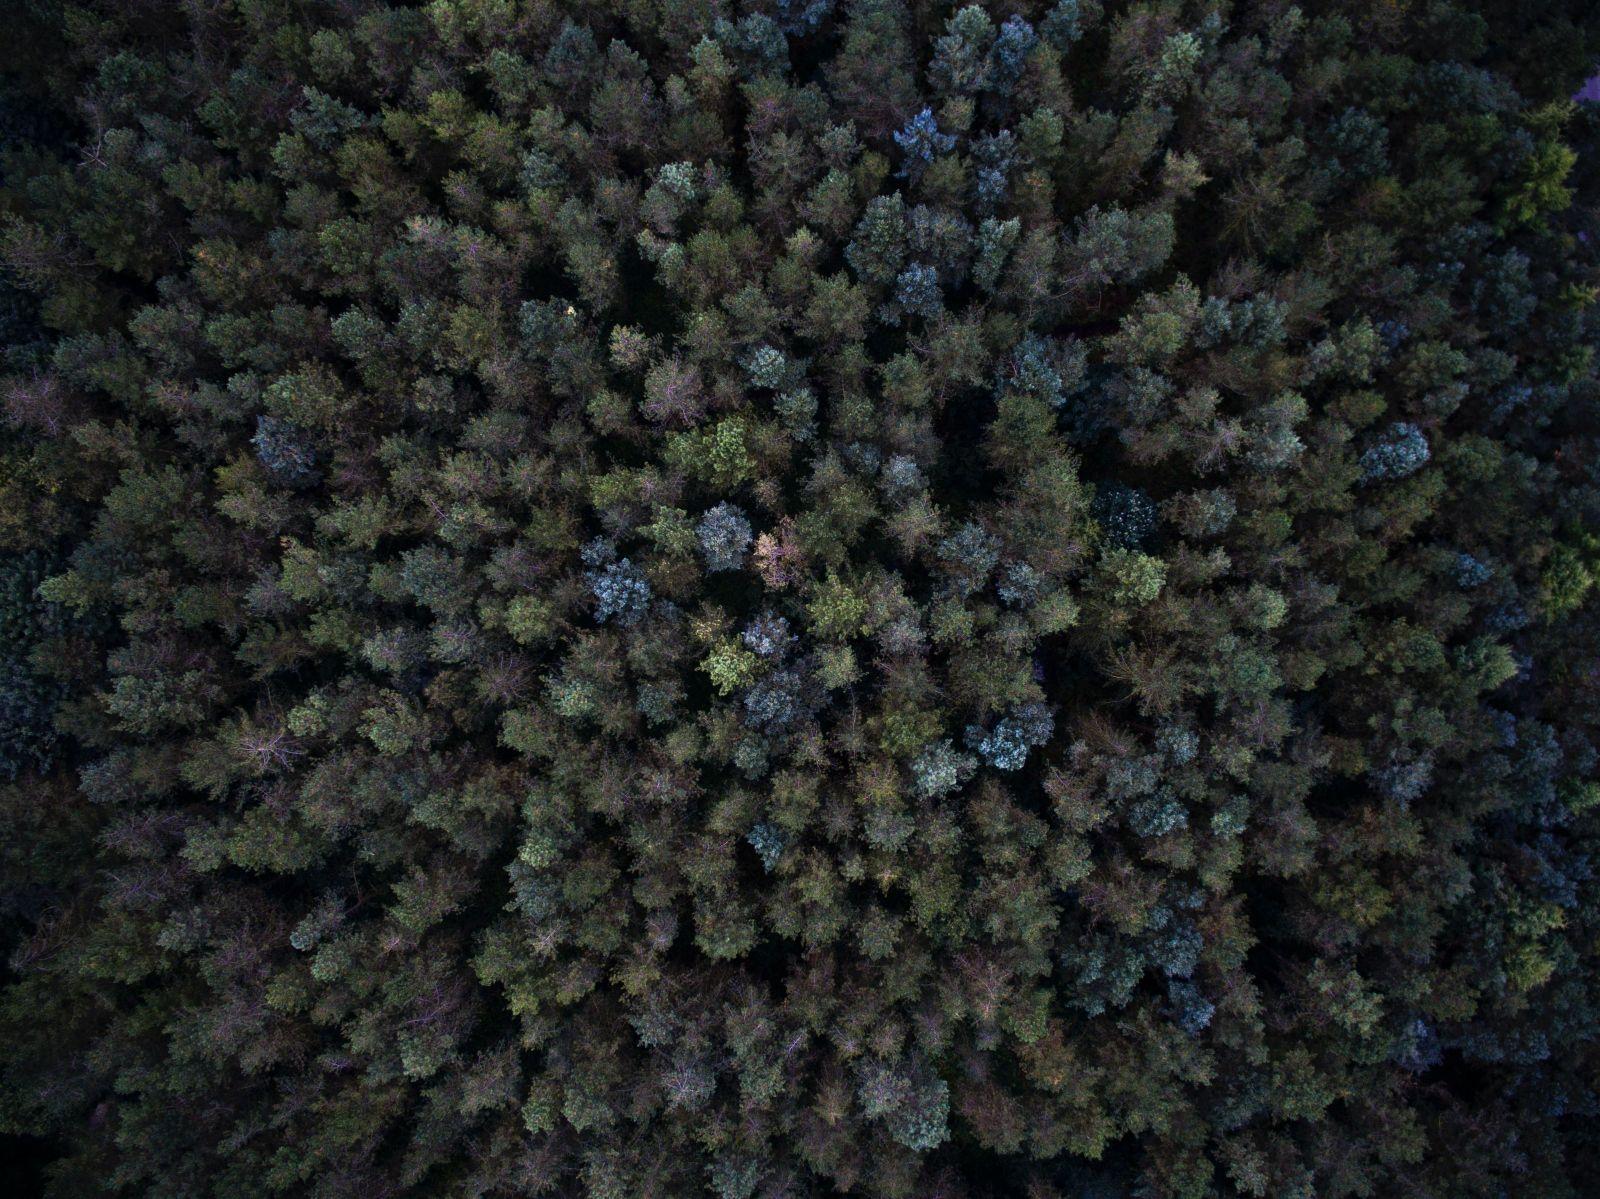 forest birds eye view